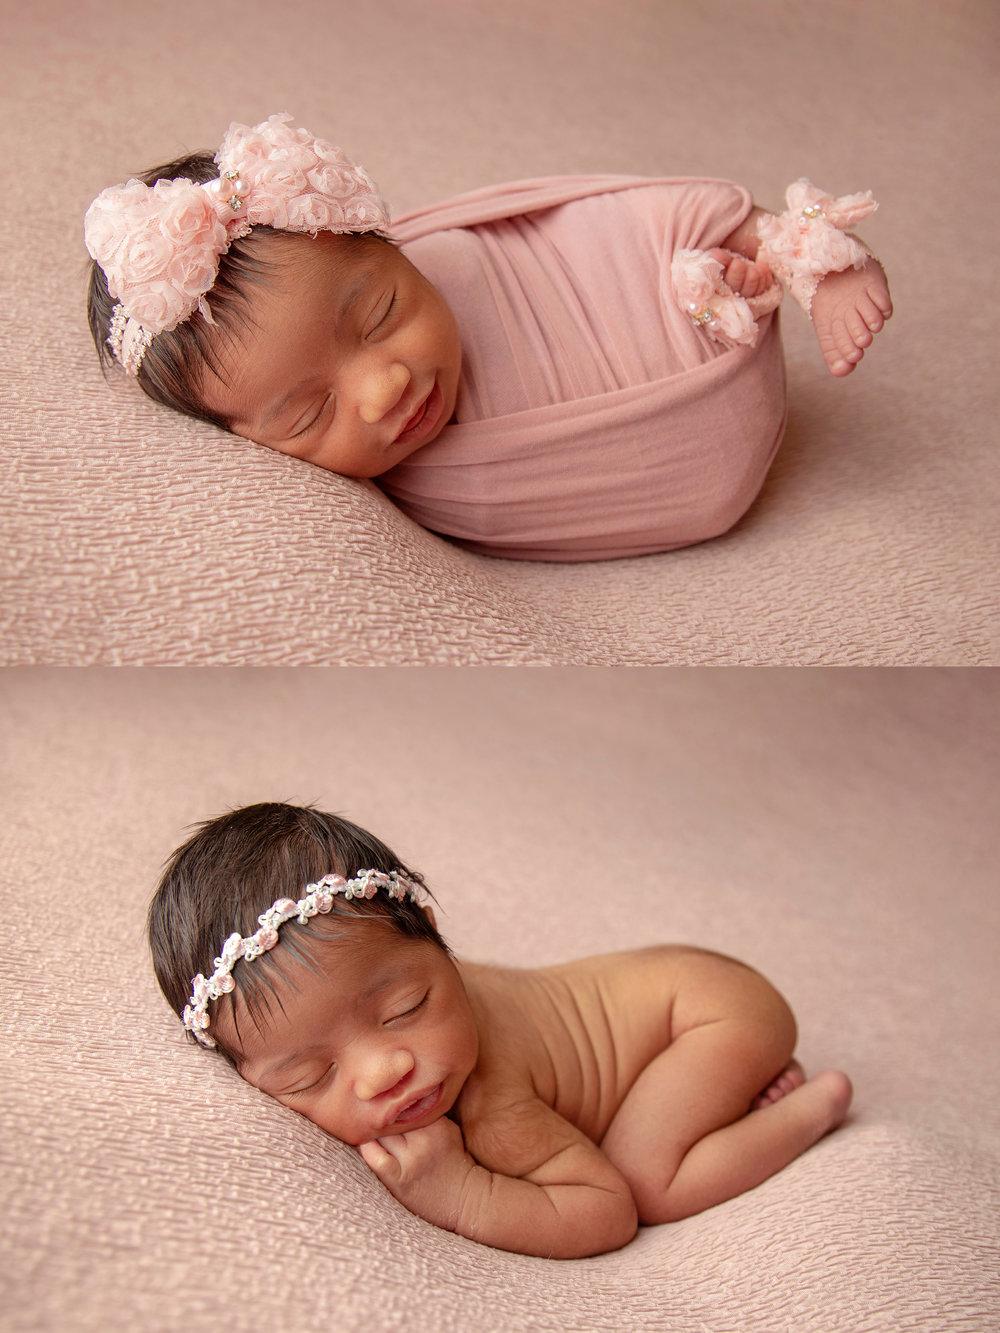 Lancaster-newborn-photographer-angie-englerth-m009.jpg